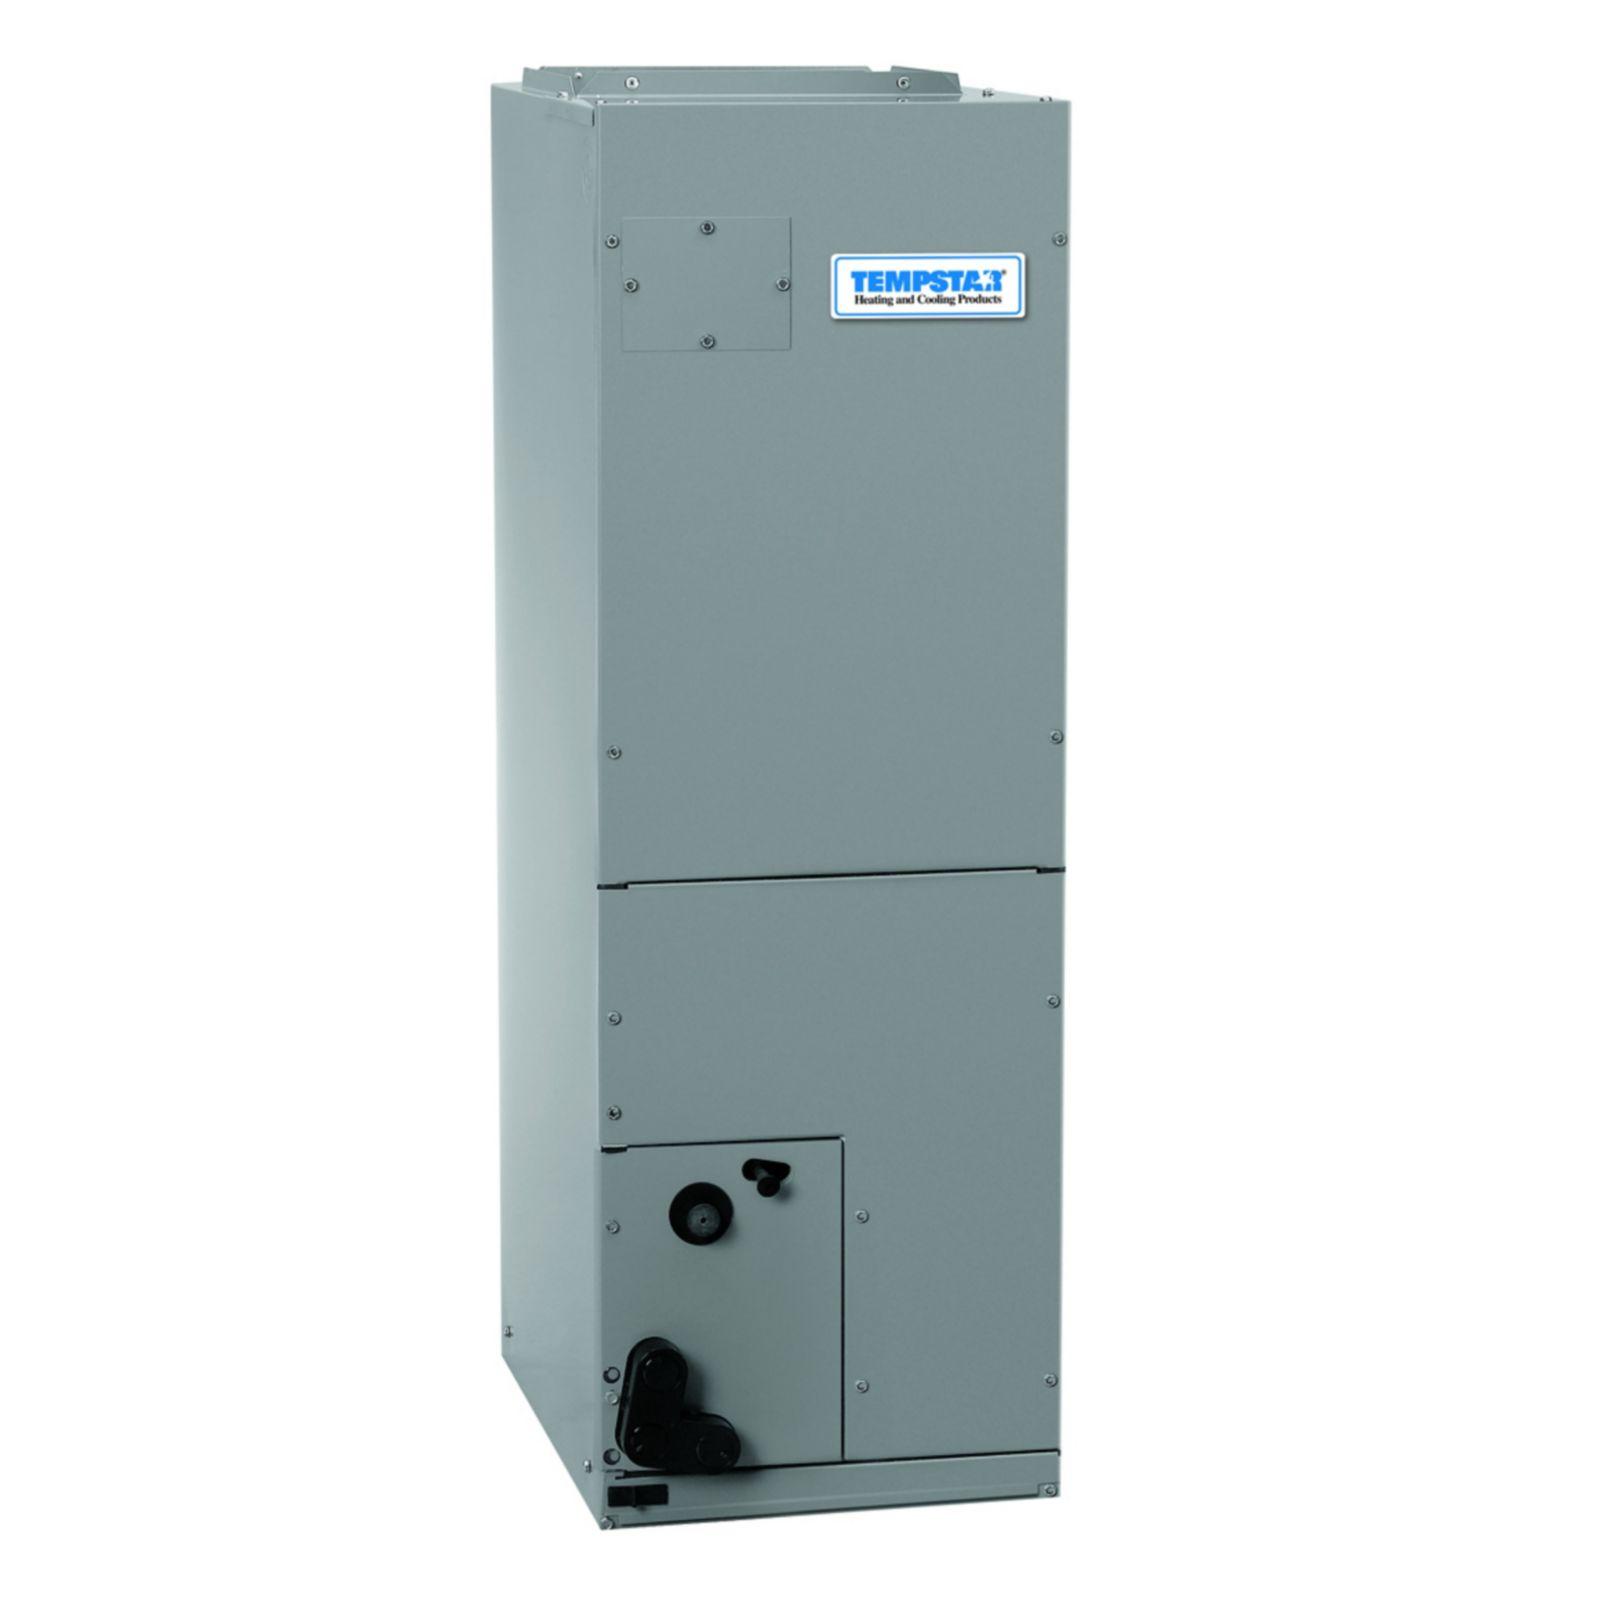 Tempstar FEM4P2400A - 2 Ton, R410A, Multi-position ECM 5-Speed Fan ...